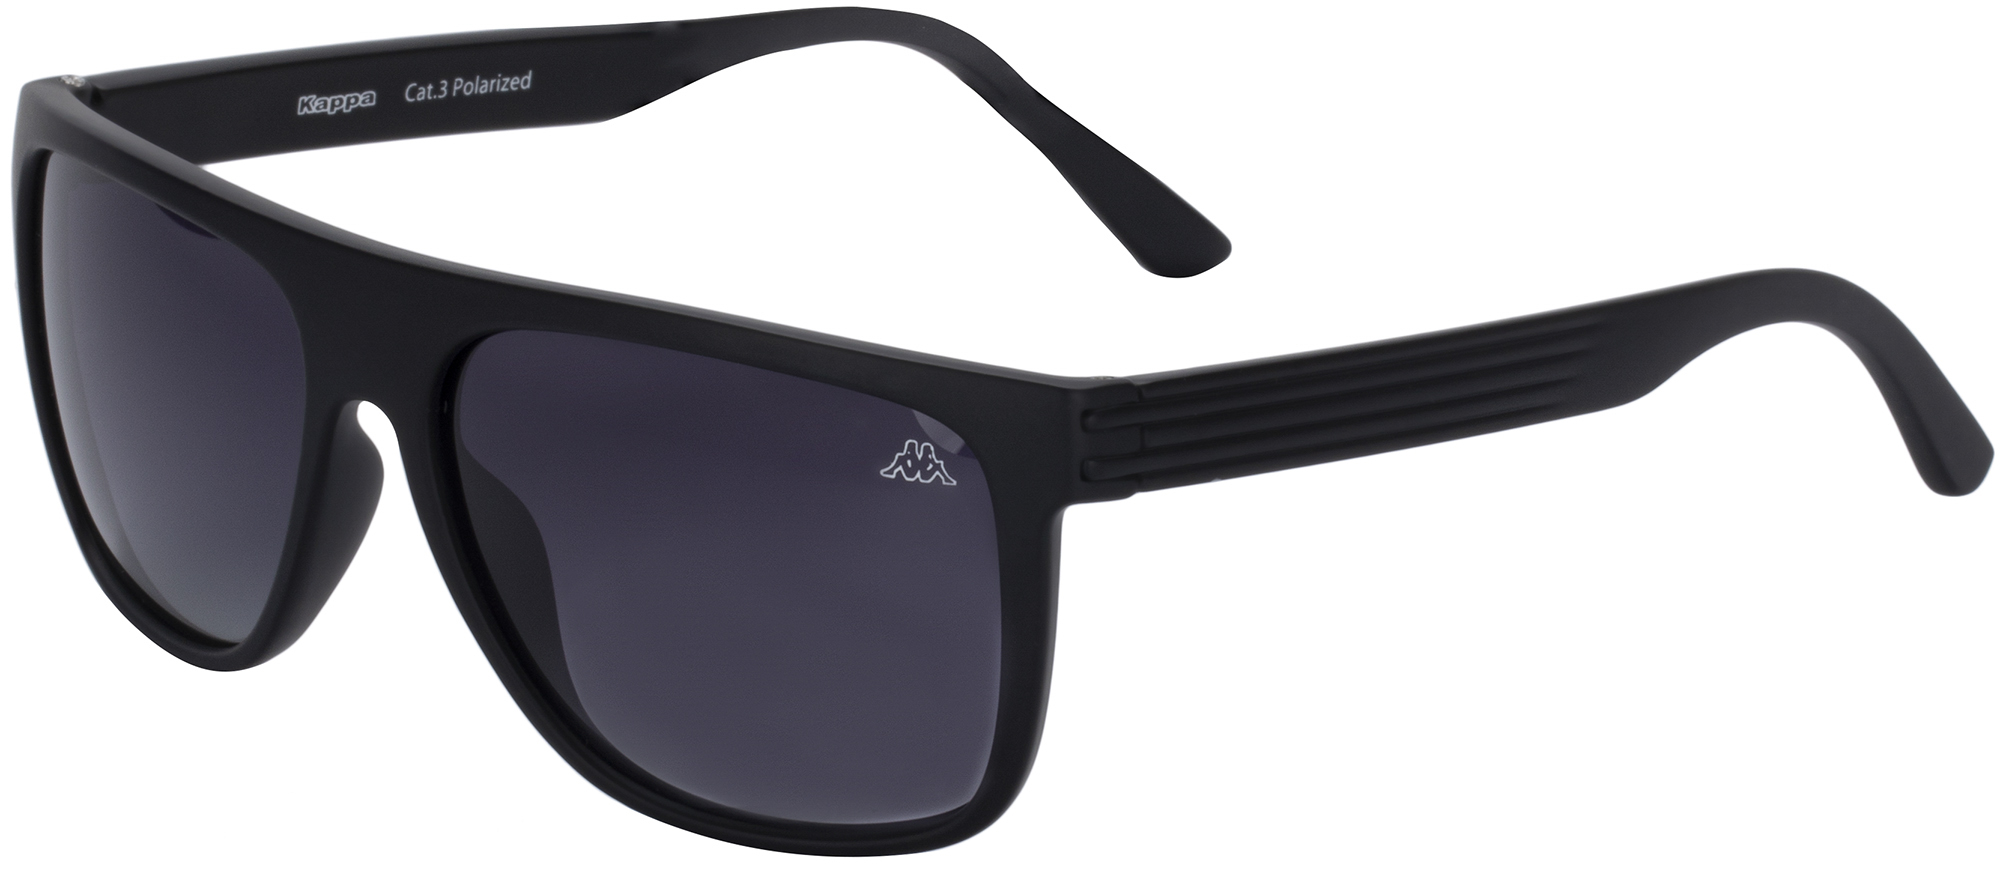 Kappa Солнцезащитные очки Kappa очки солнцезащитные jack